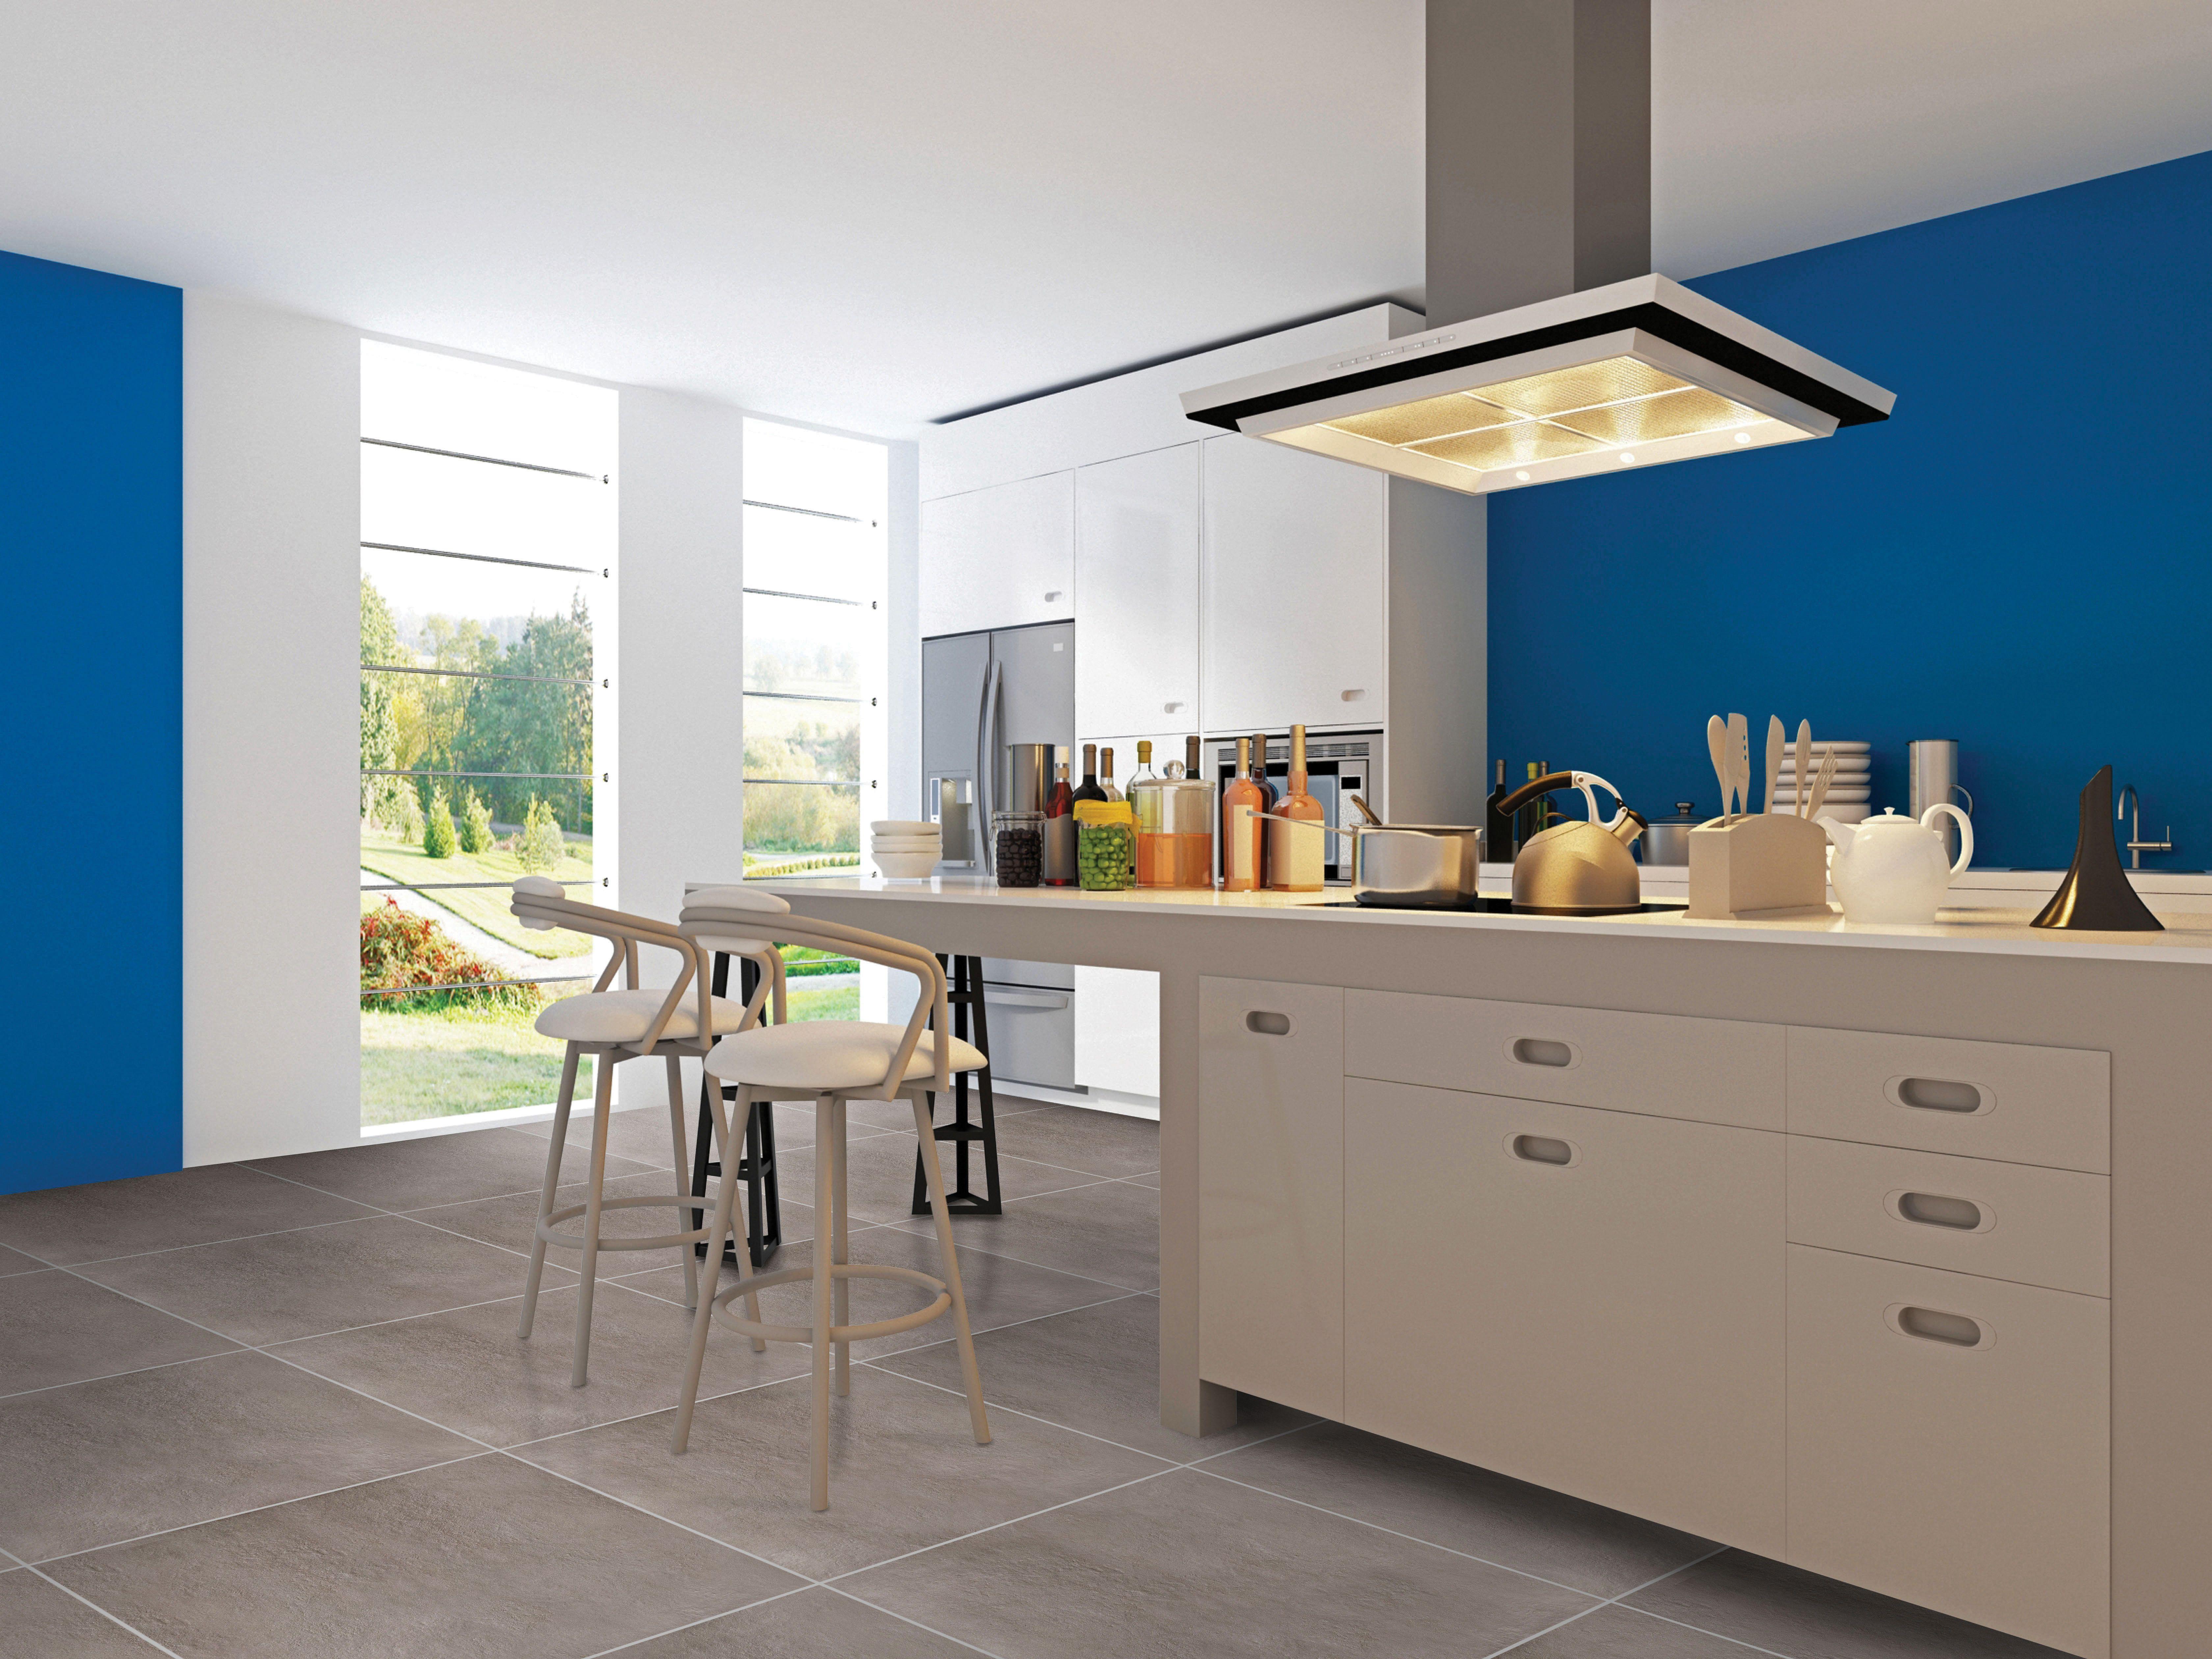 that mood porcelain innovation wood tiles inwood look floors and in full floor ceramic porcelaingres parquet like